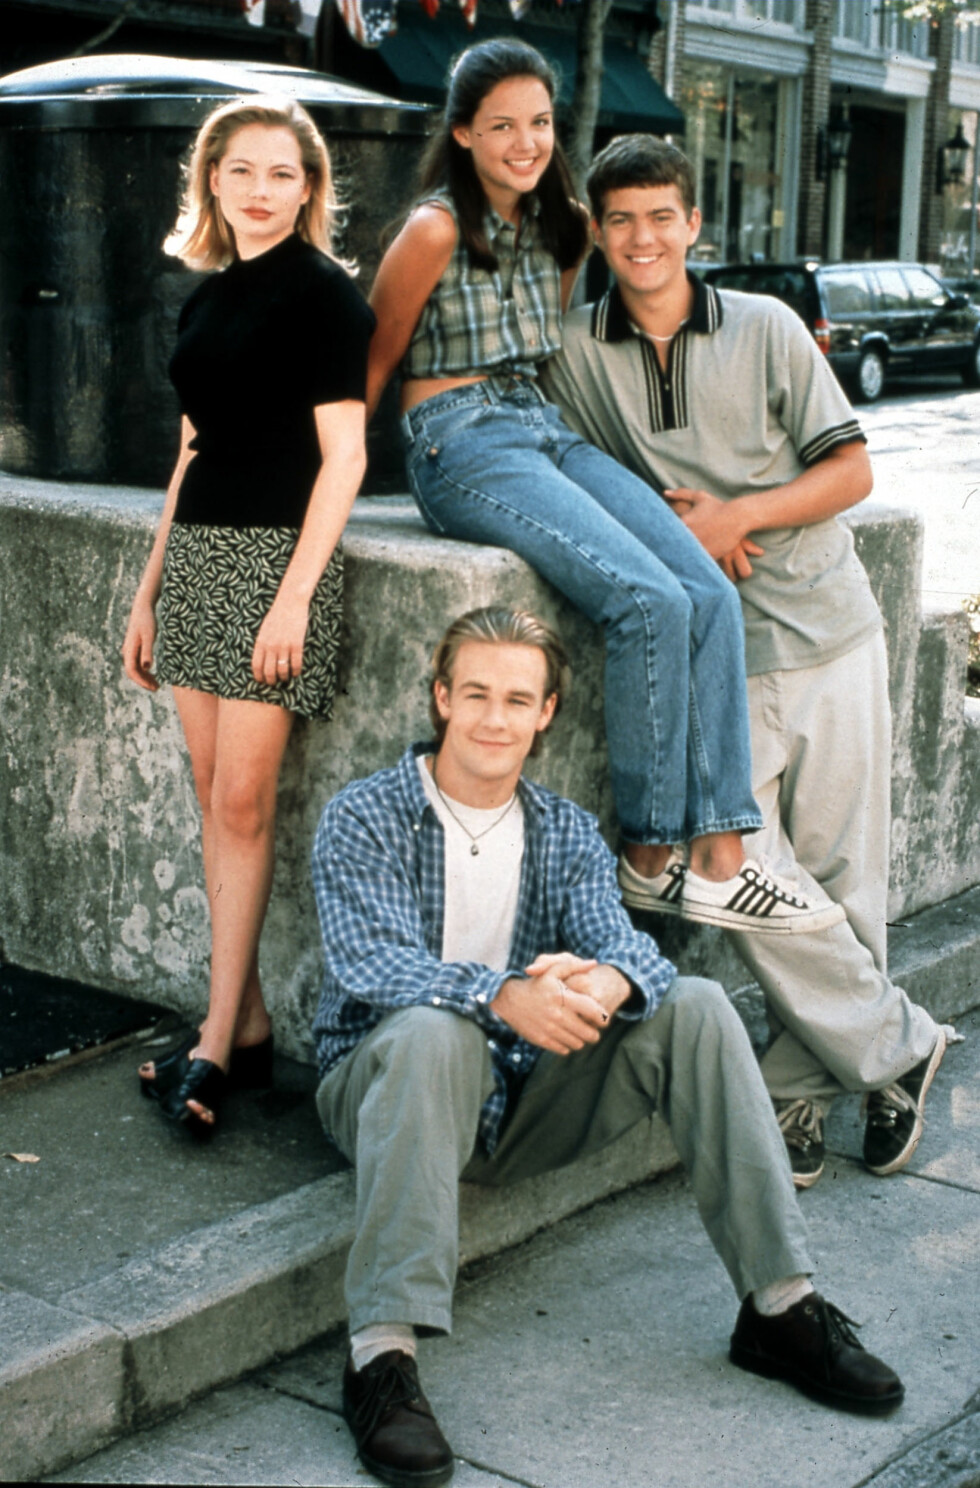 POPULÆR GJENG: Fra 1998 til 2003 spilte Joshua sammen med Katie Holmes, James Van Der Beek og Michelle Williams i ungdomsserien «Dawson's Creek». TV-serien har også gått i reprise i Norge en rekke ganger. Foto: Mary Evans Picture